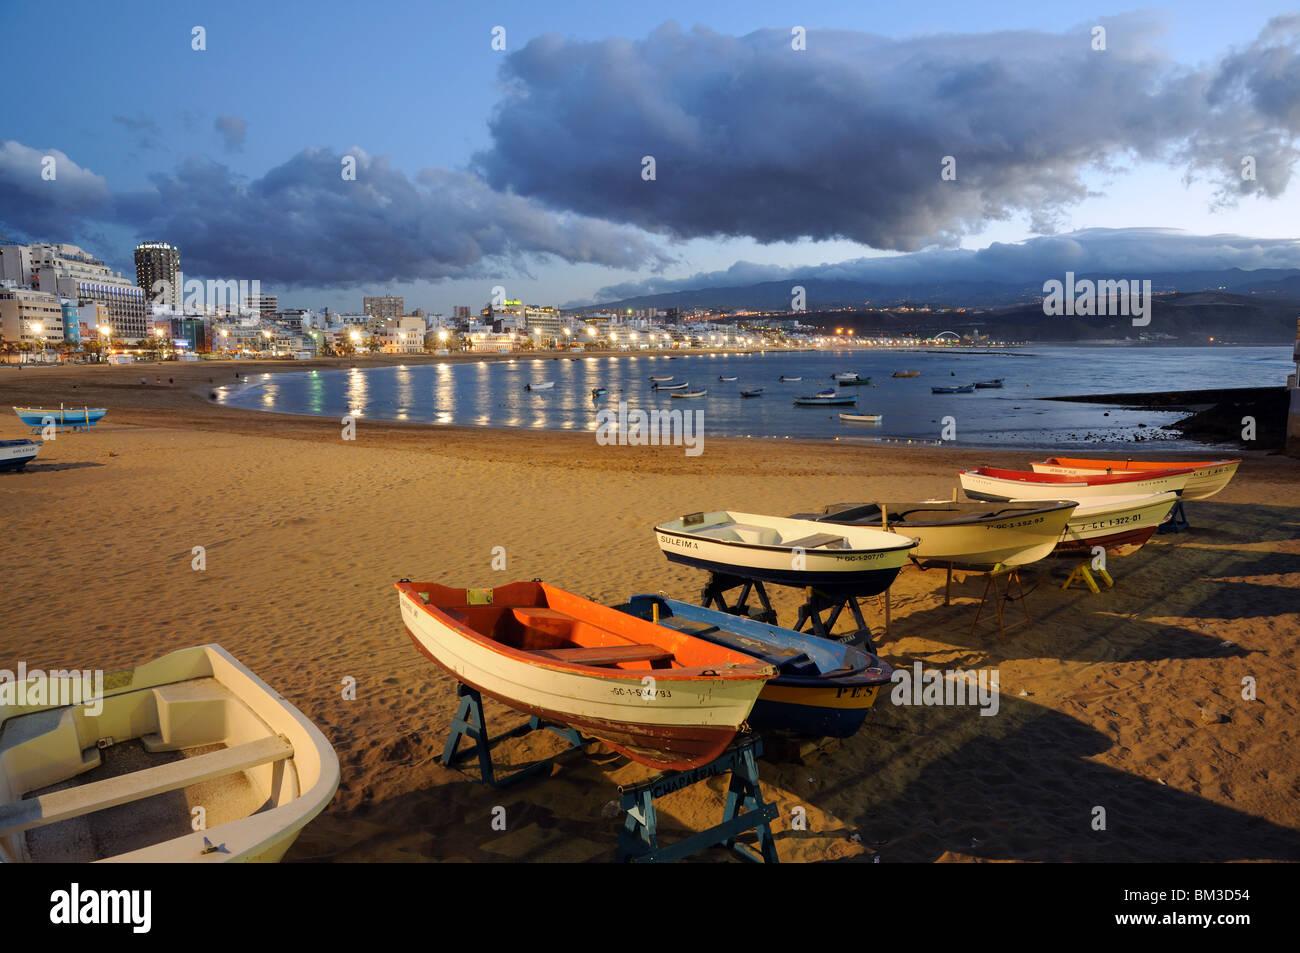 Angelboote/Fischerboote am Strand. Las Palmas de Gran Canaria, Spanien Stockbild